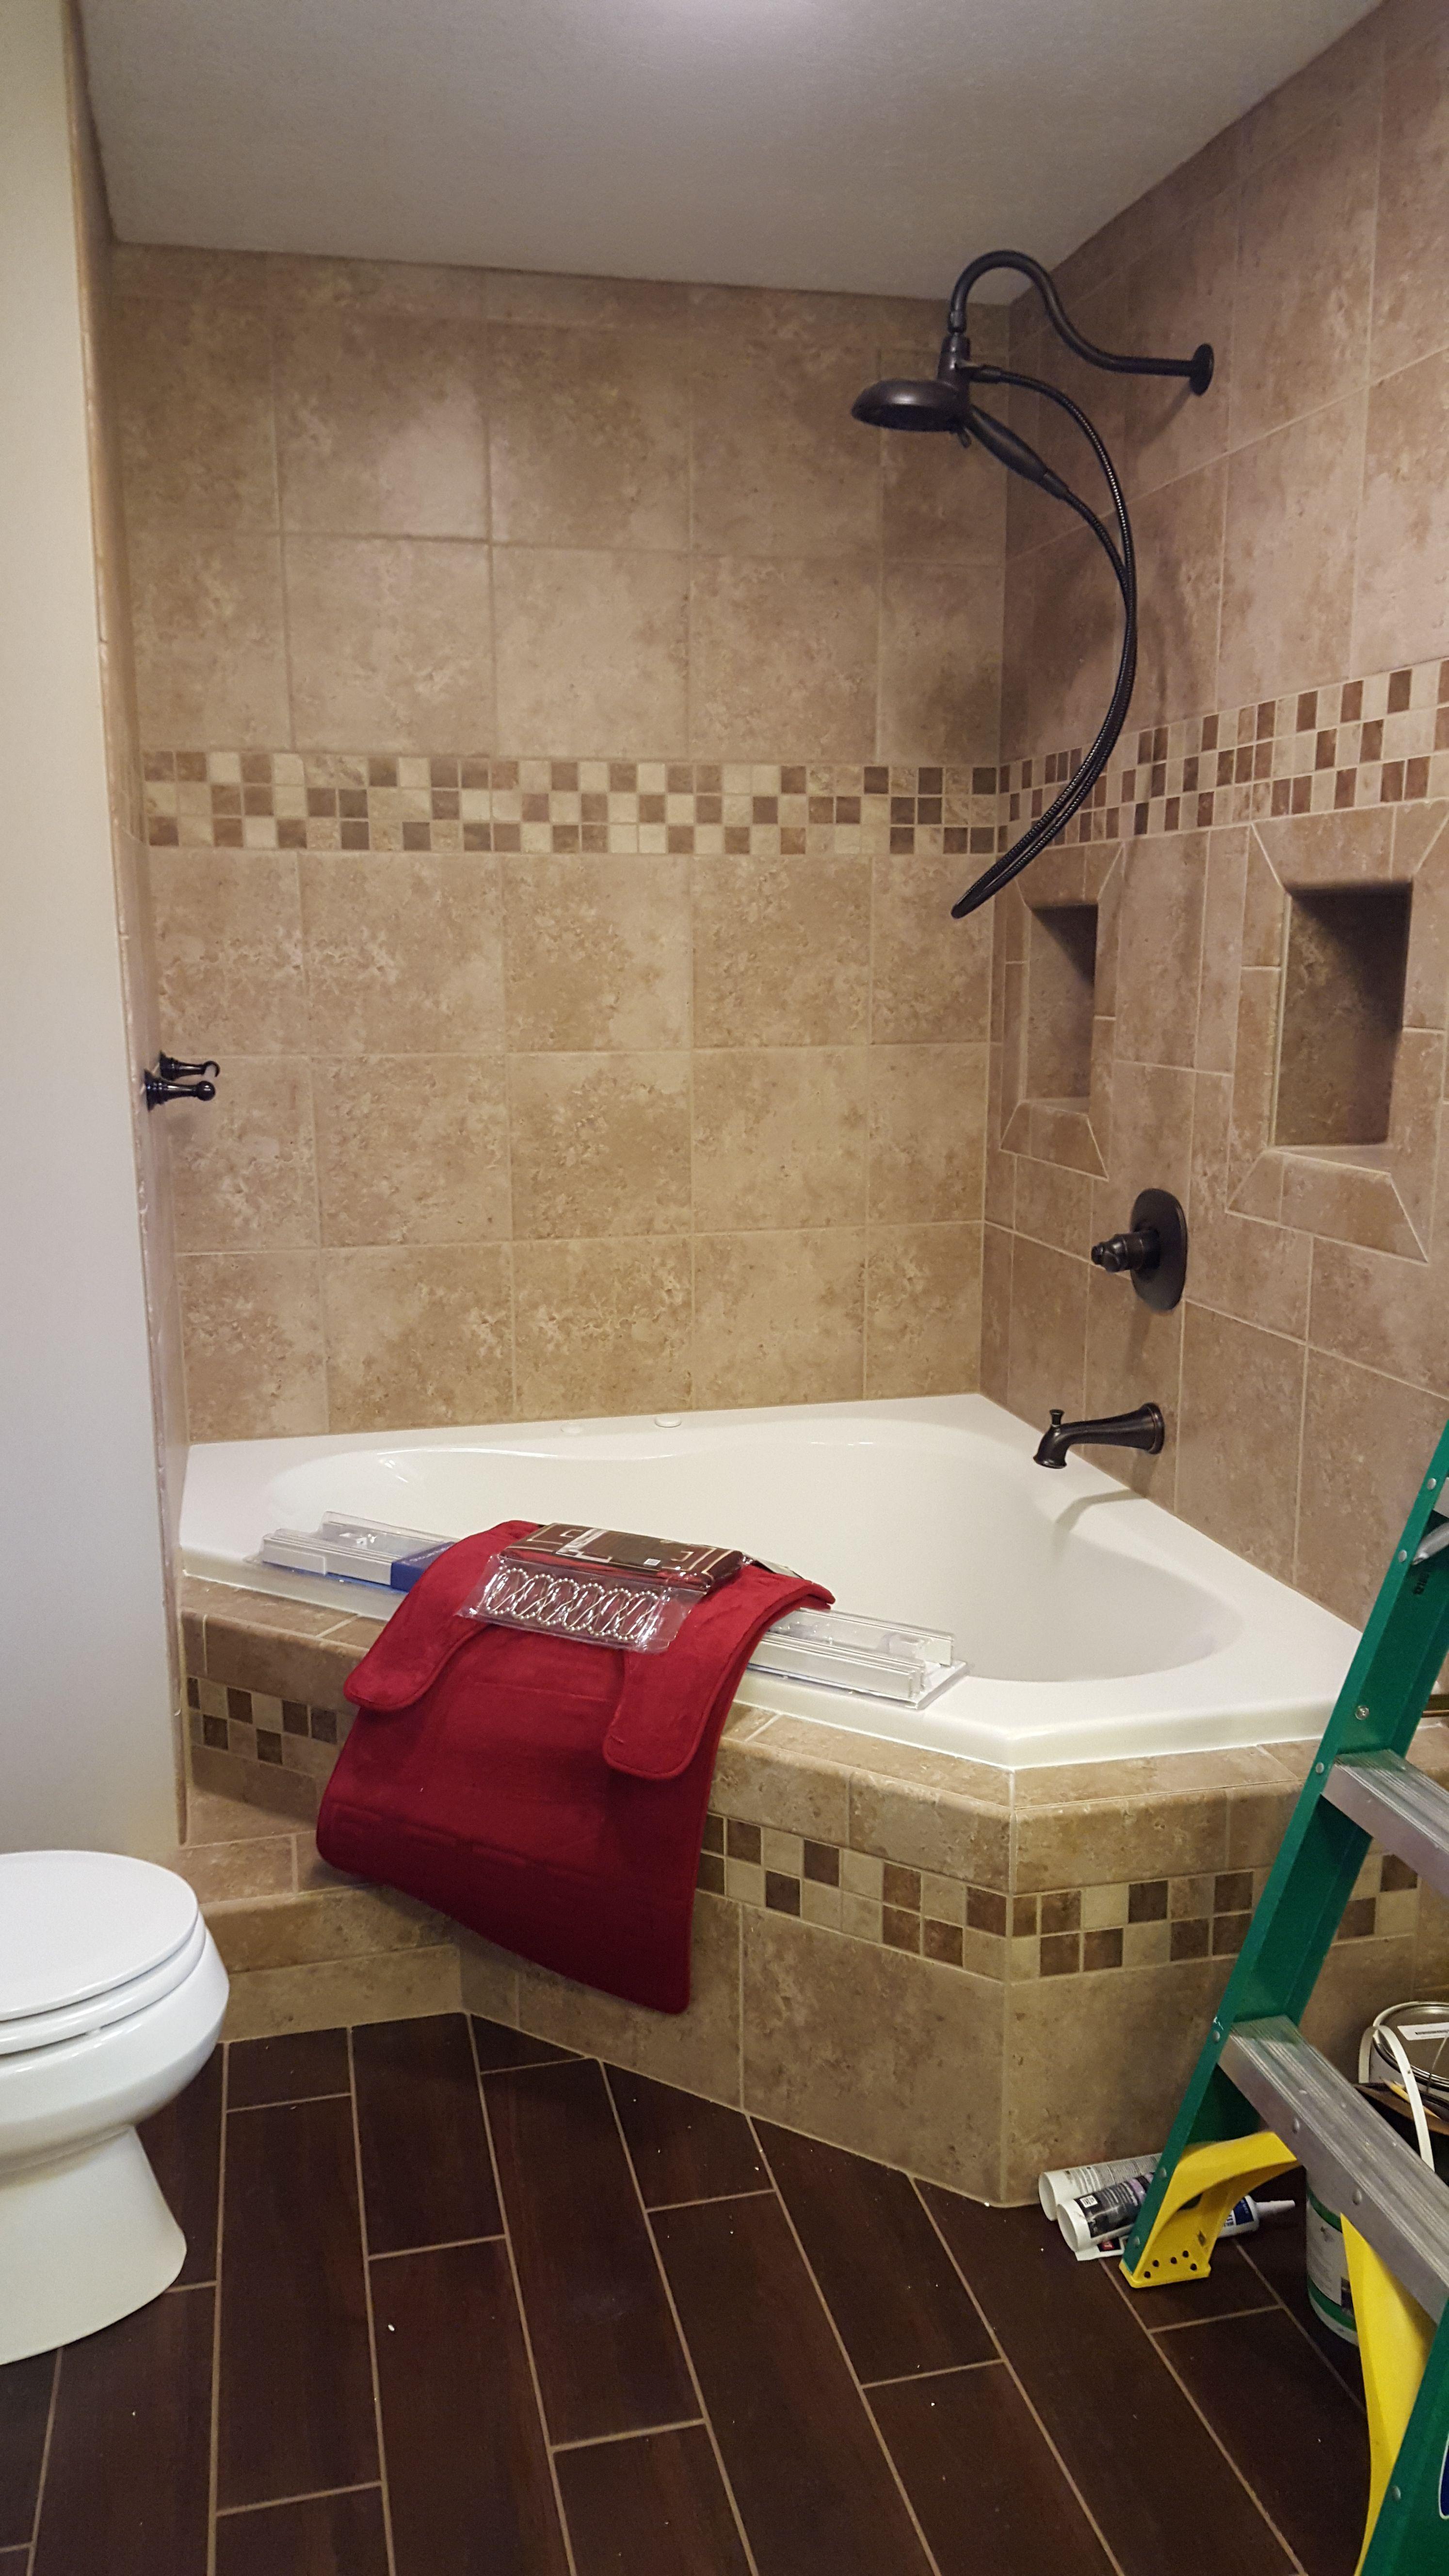 Corner Tub With Shower Bathtub Remodel Corner Tub Shower Corner Tub Shower Combo